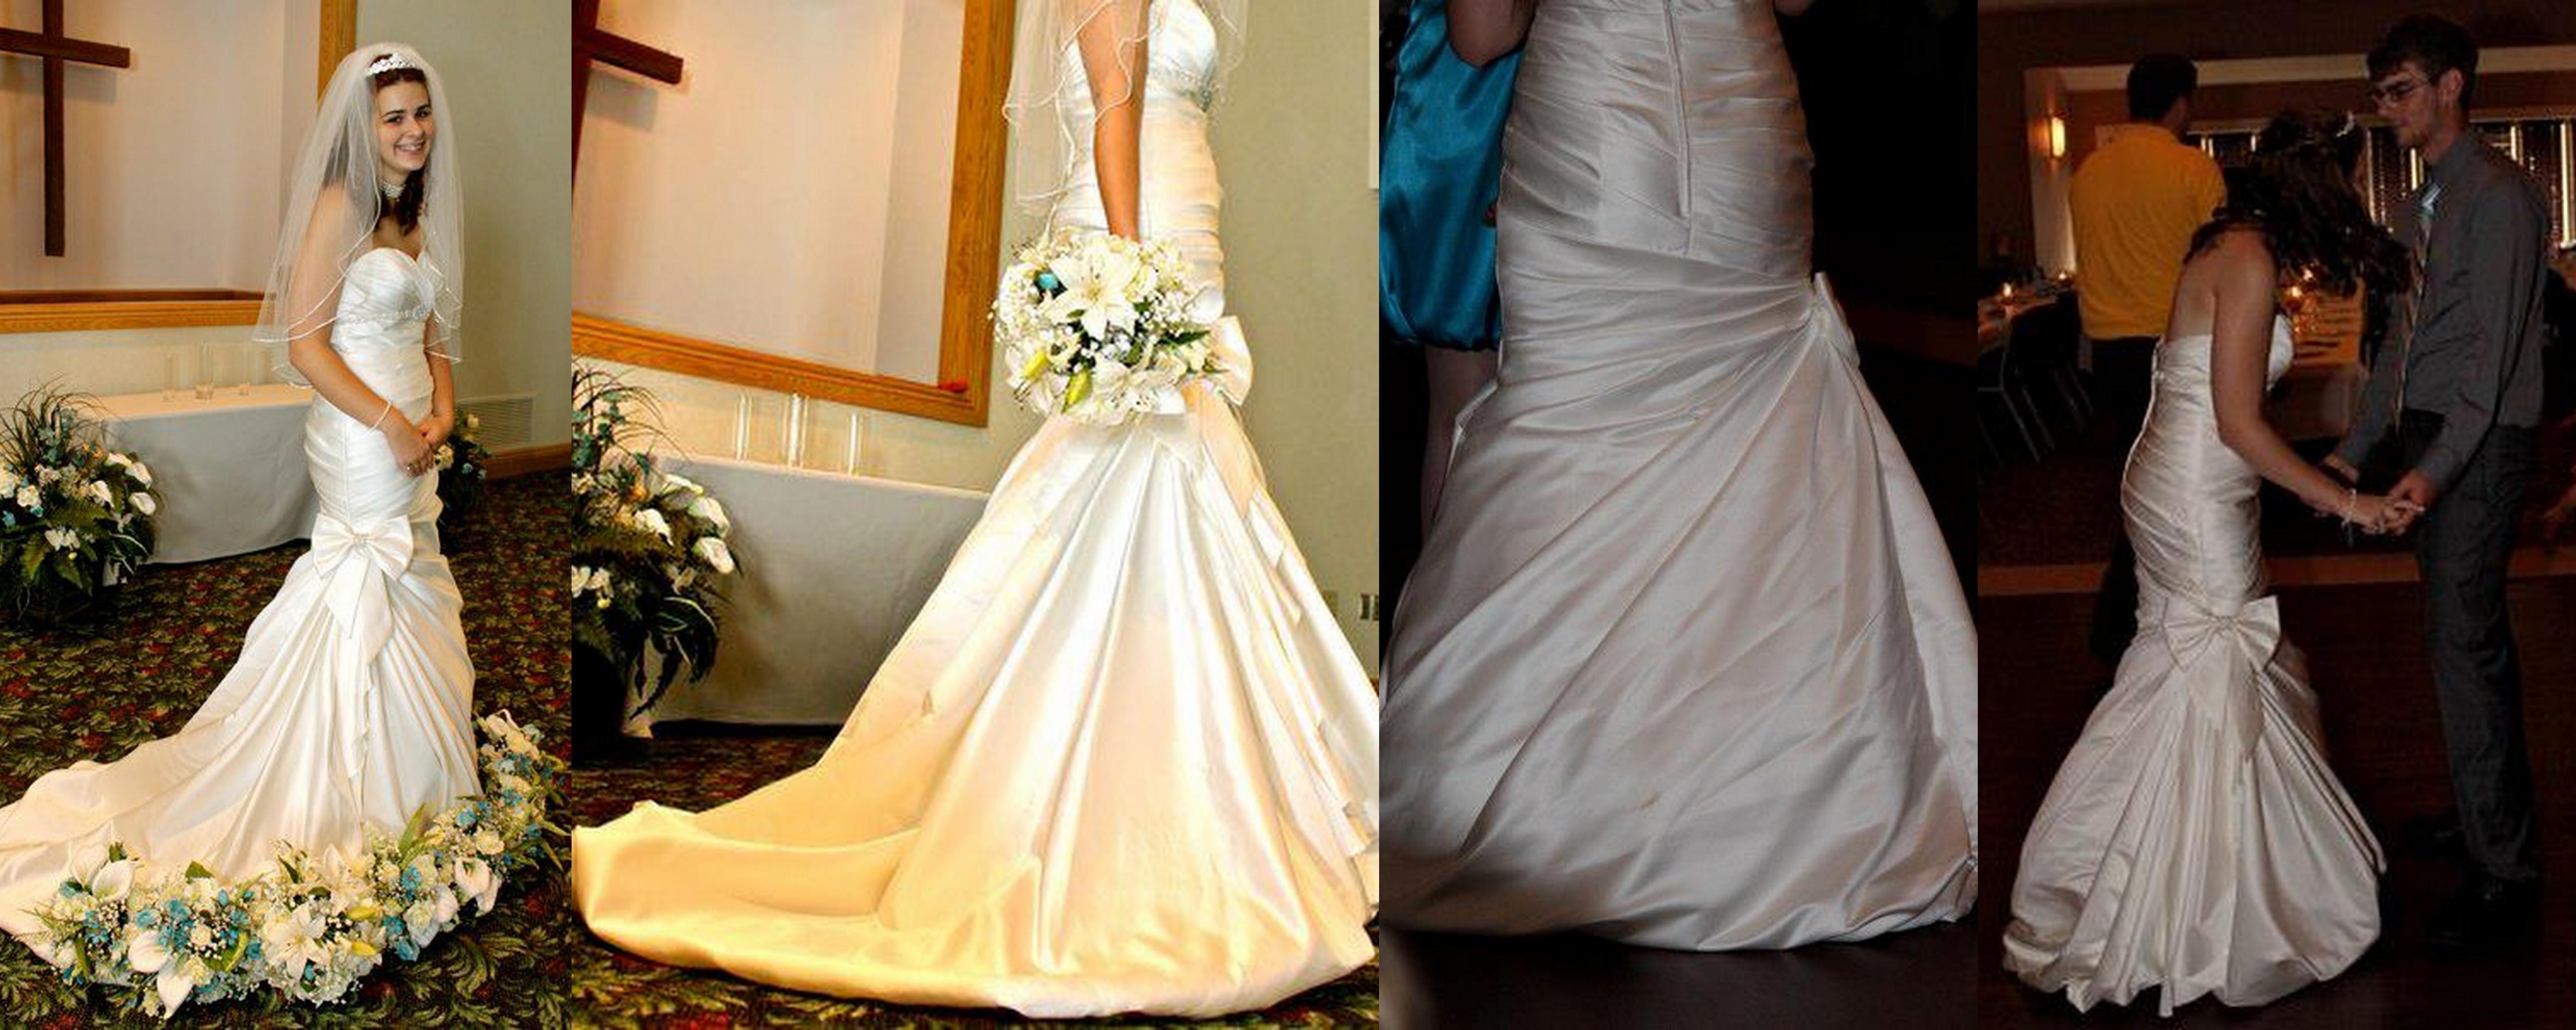 DIY Wedding Dress Bustle